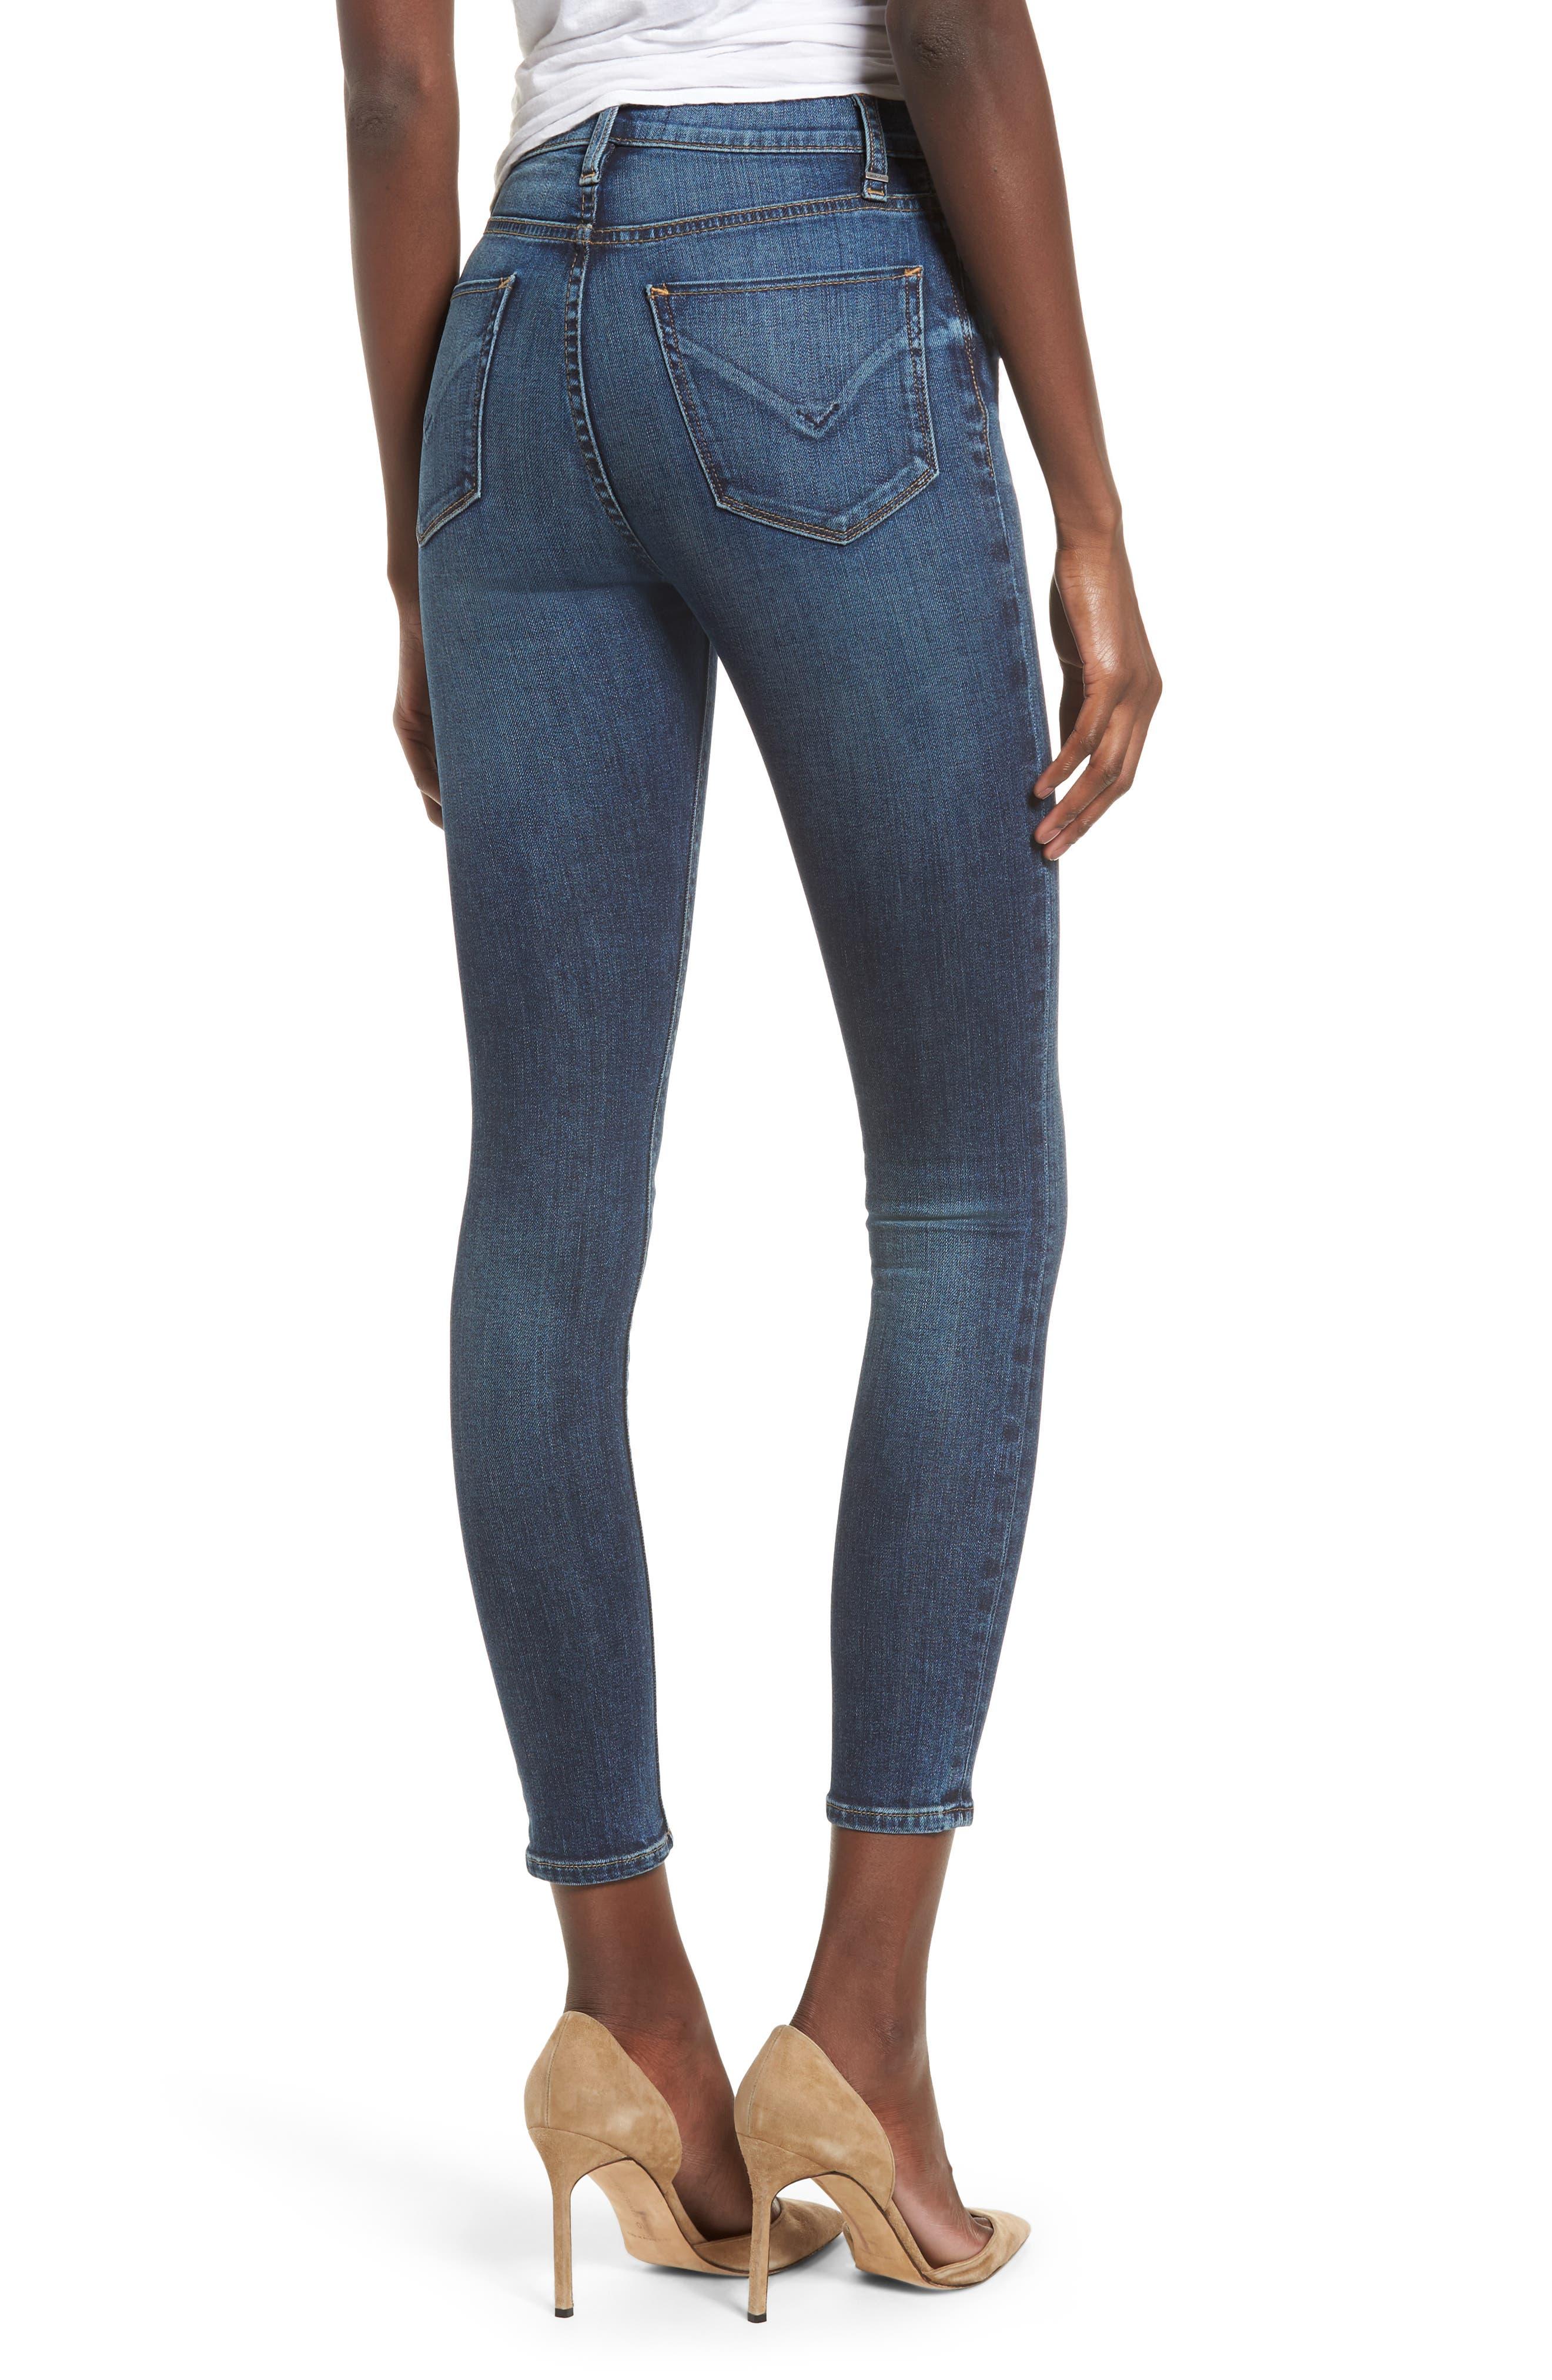 Barbara High Waist Ankle Skinny Jeans,                             Alternate thumbnail 2, color,                             CLEAN SIDE BAR